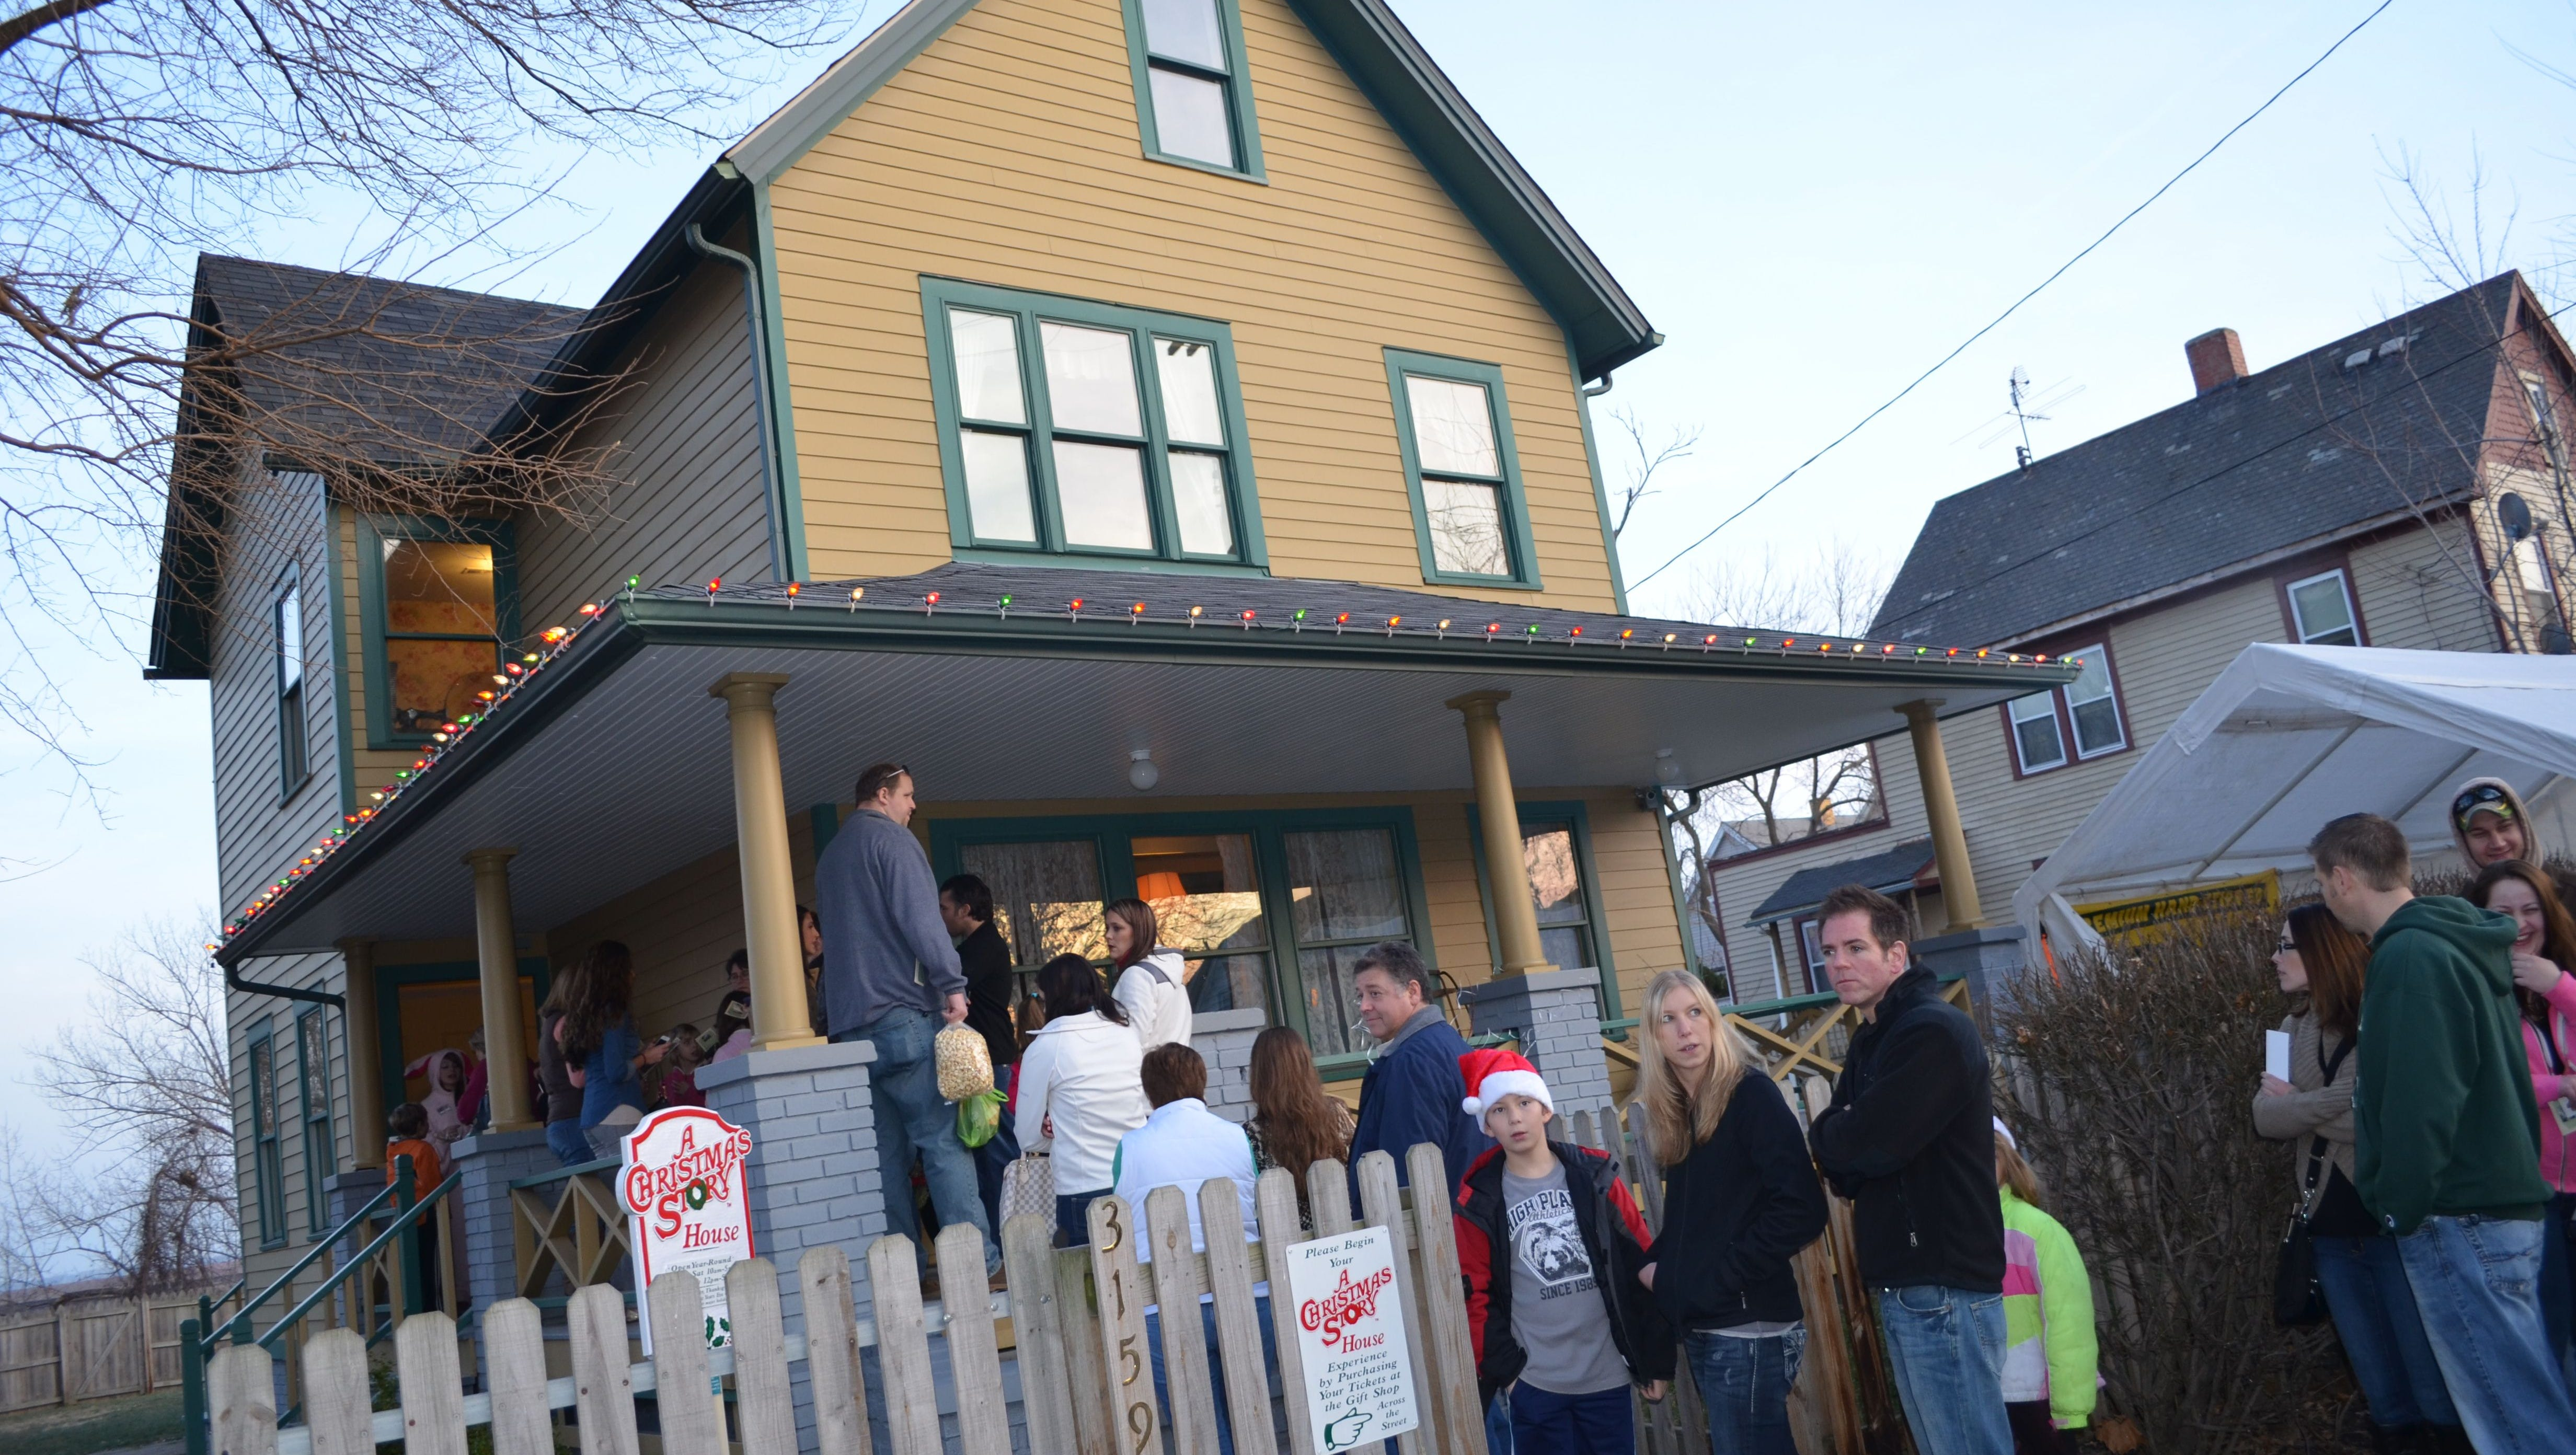 Christmas Story' house